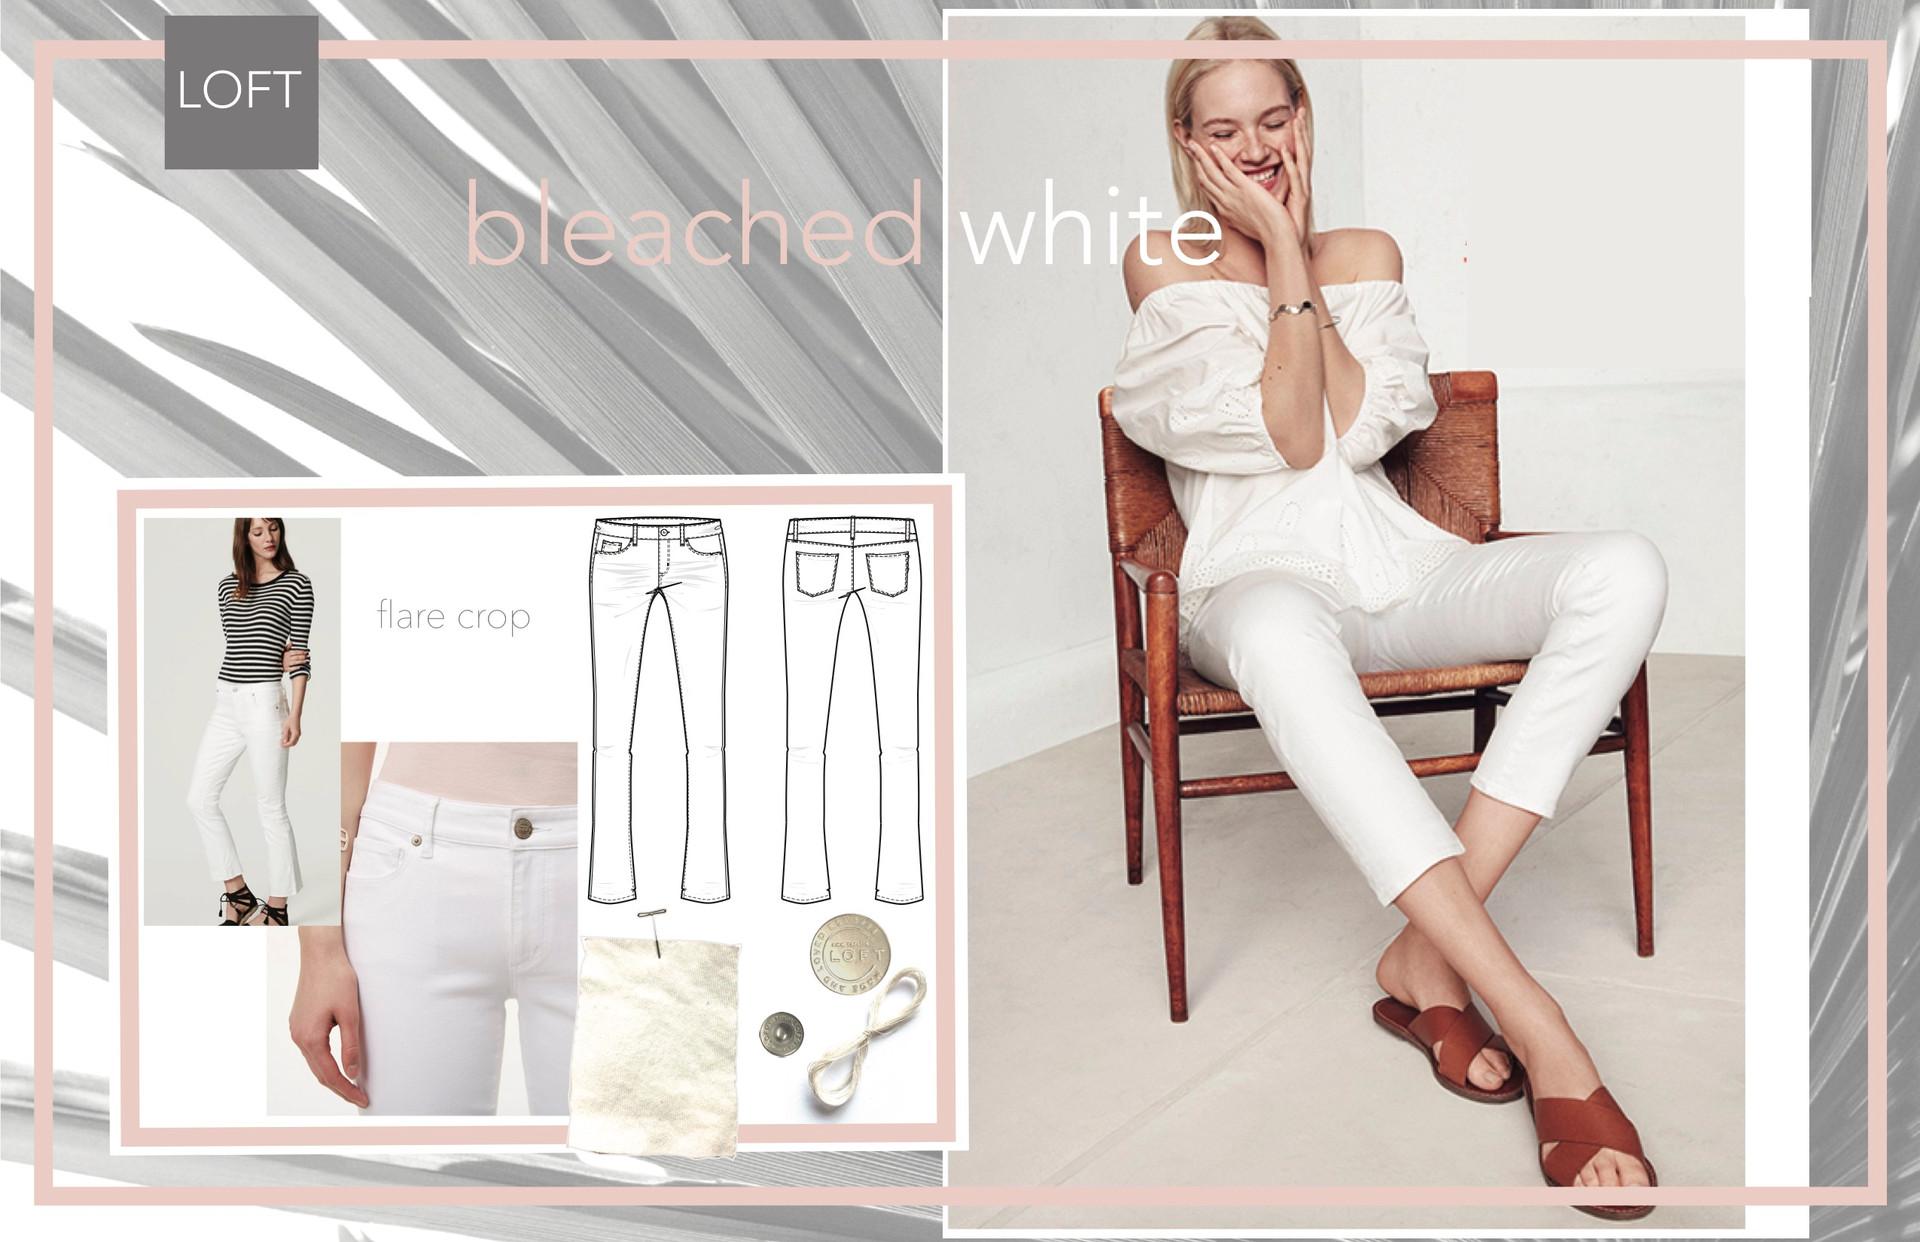 7- bleached white 1.jpg